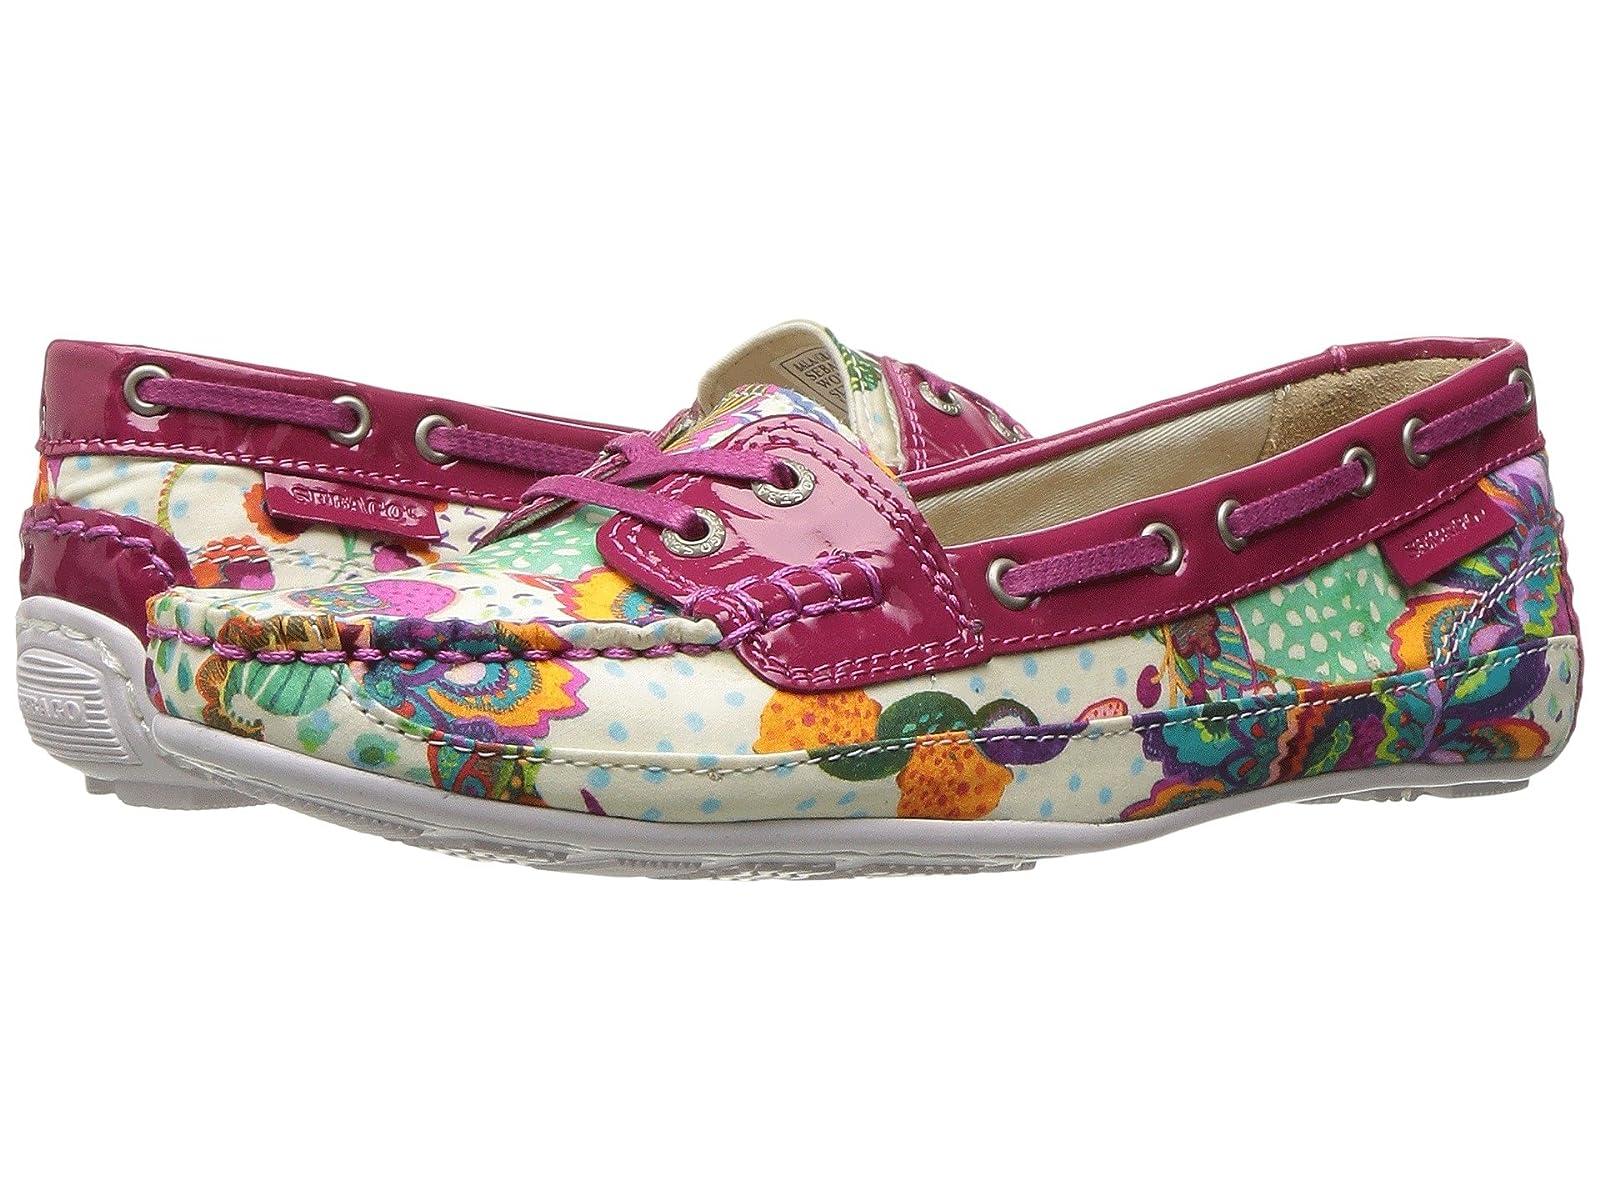 Sebago Bala LibertyCheap and distinctive eye-catching shoes